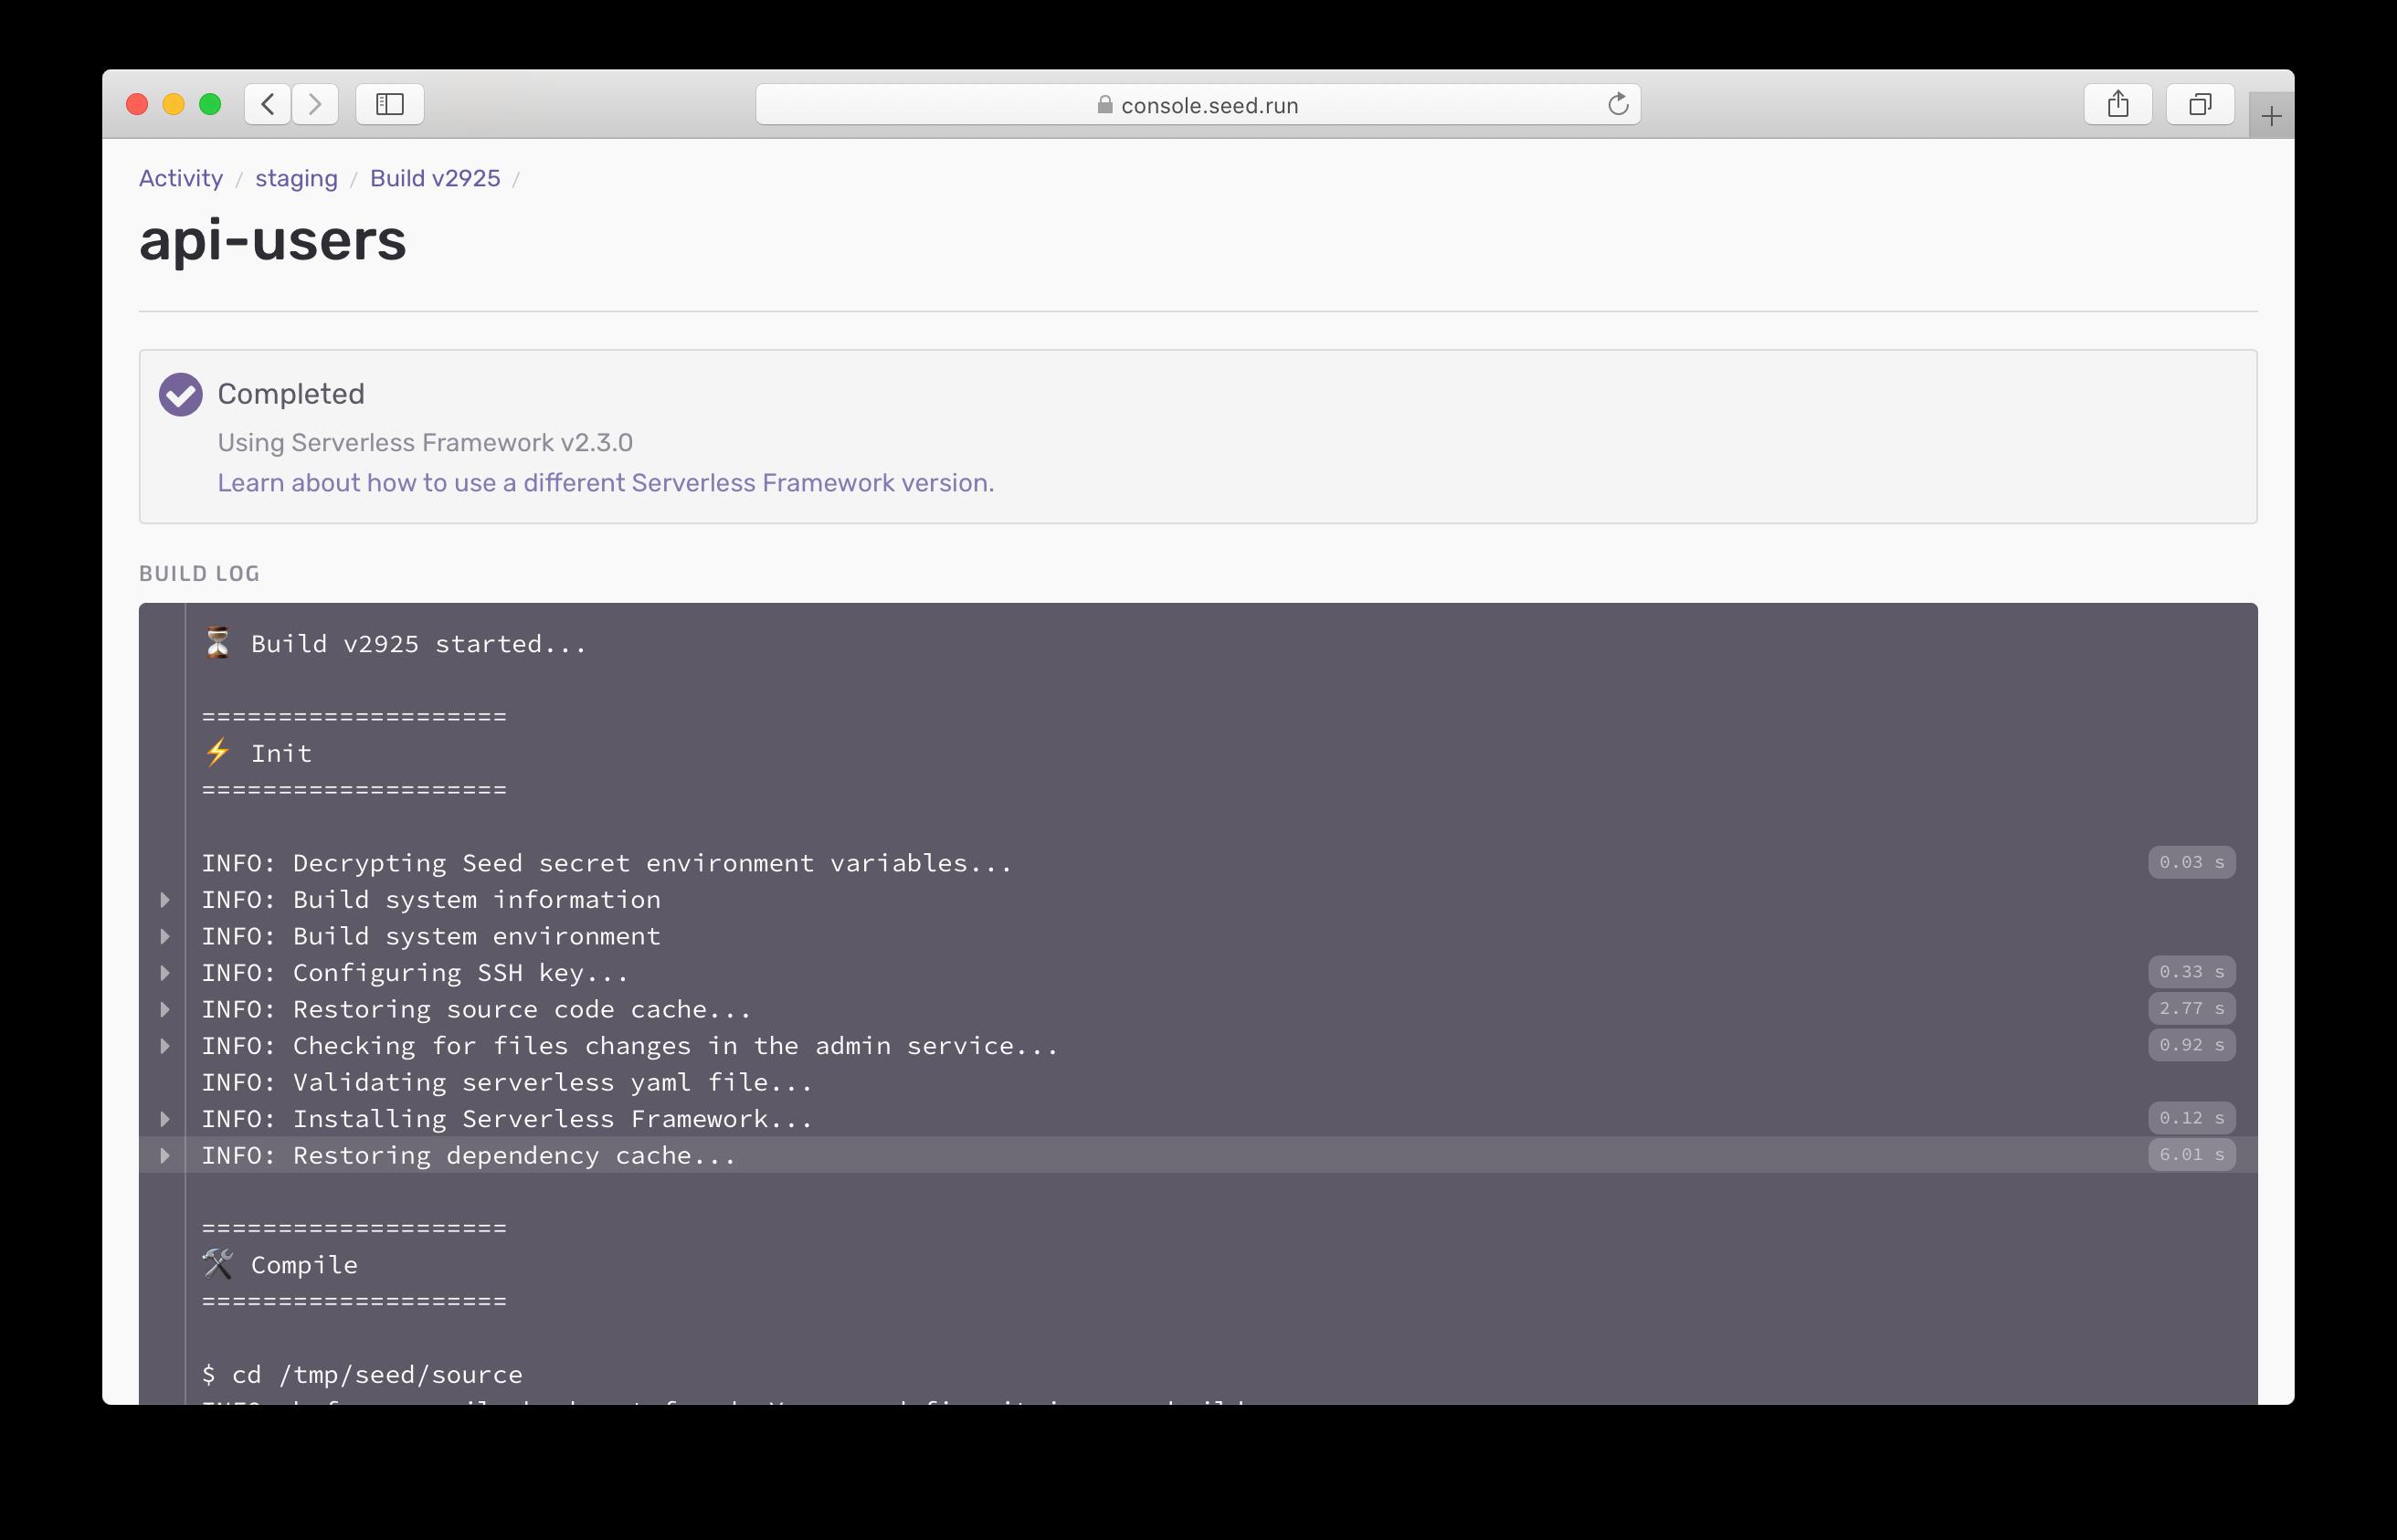 Seed cache optimization build log